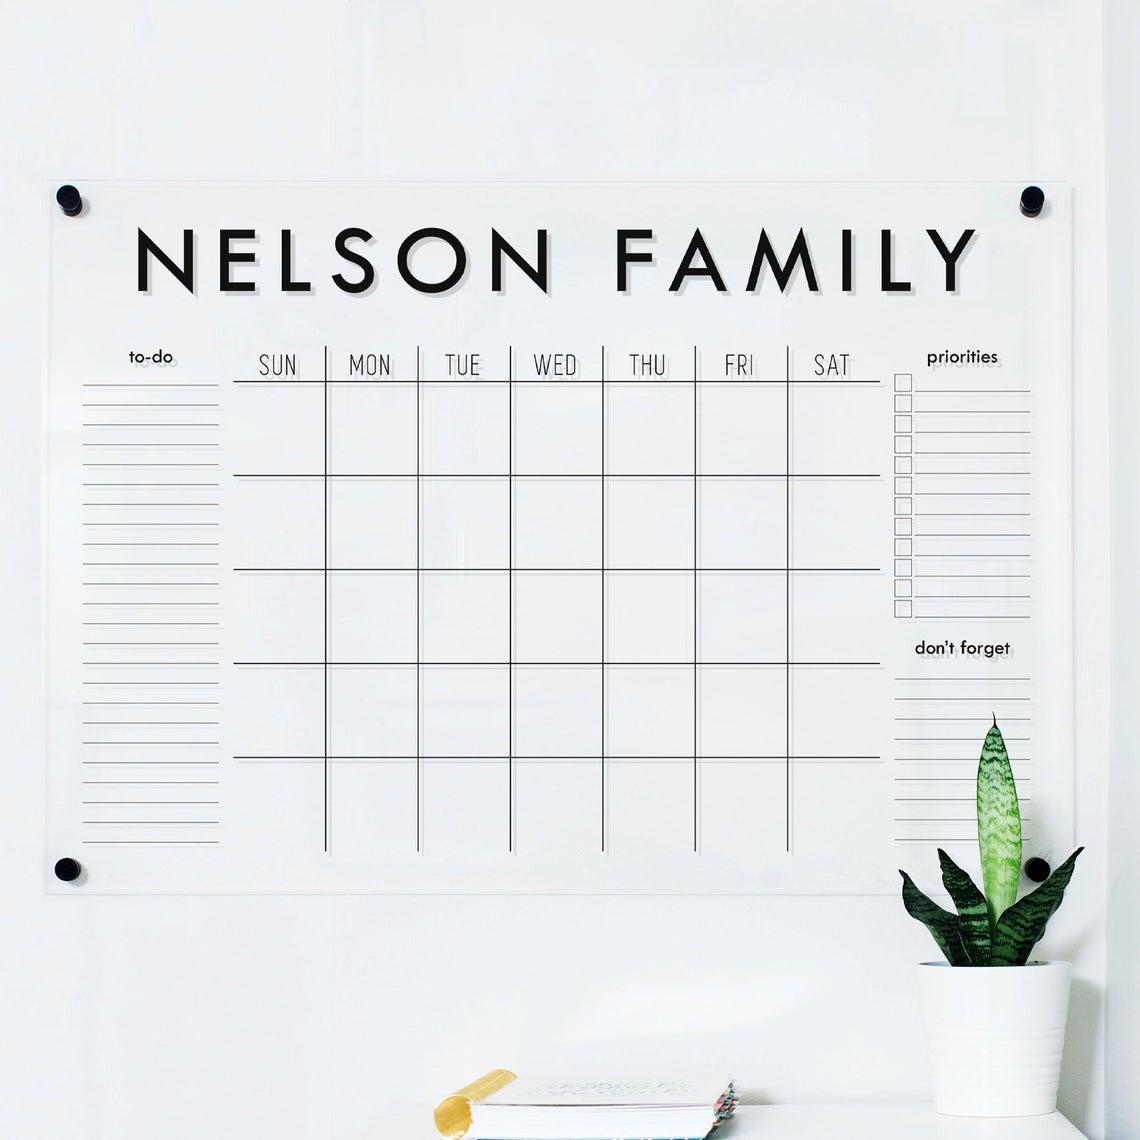 Family Gift Ideas